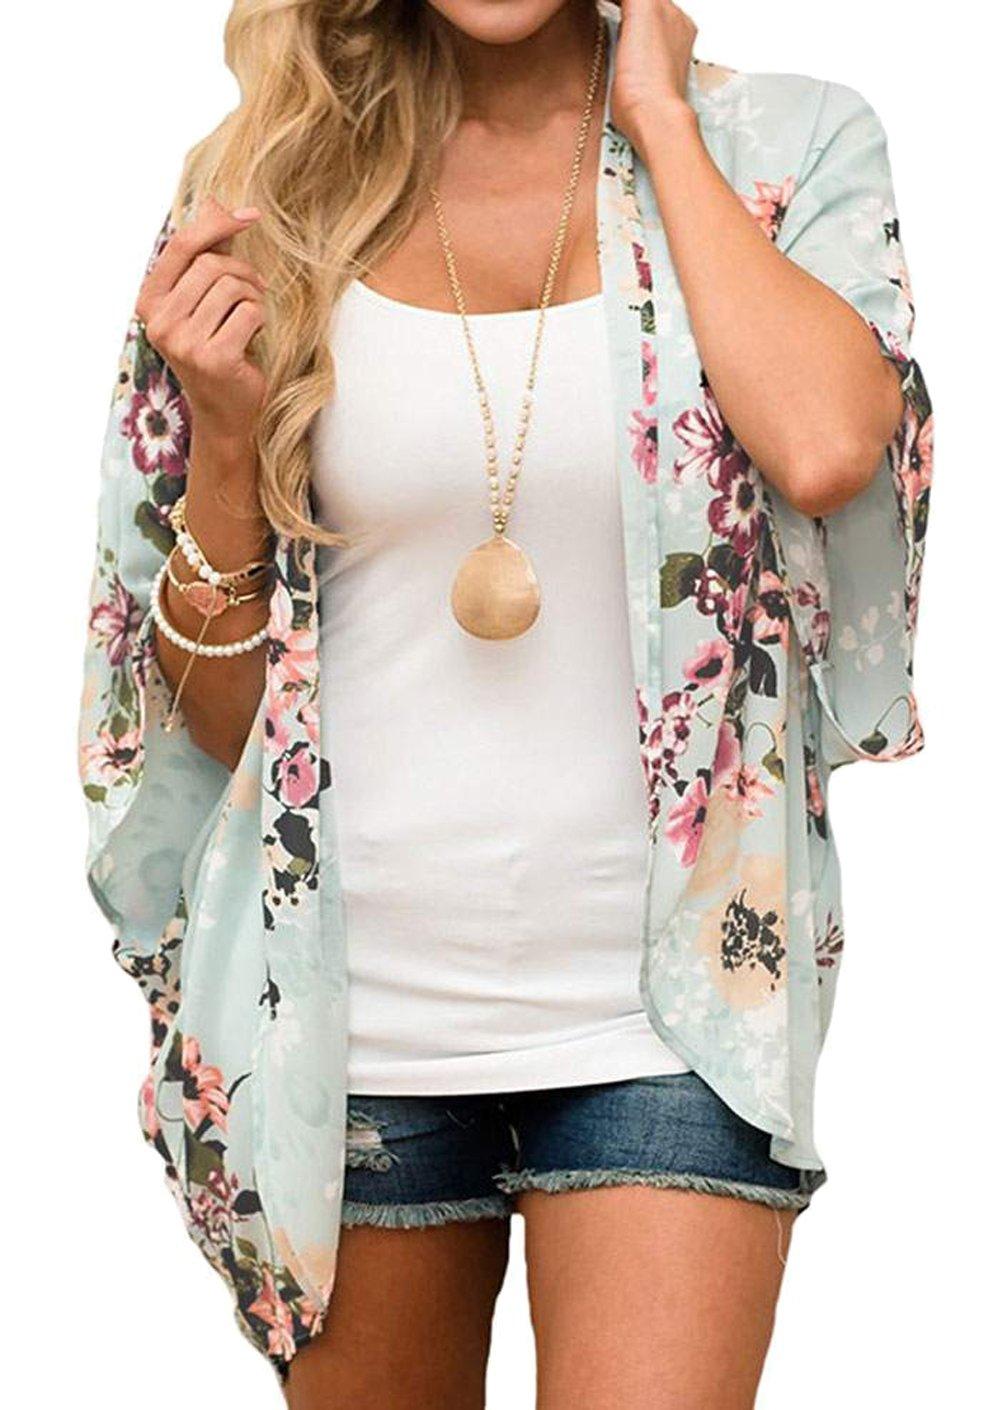 Relipop Women's Sheer Chiffon Blouse Loose Tops Kimono Floral Print Cardigan (XX-Large, Style 33)